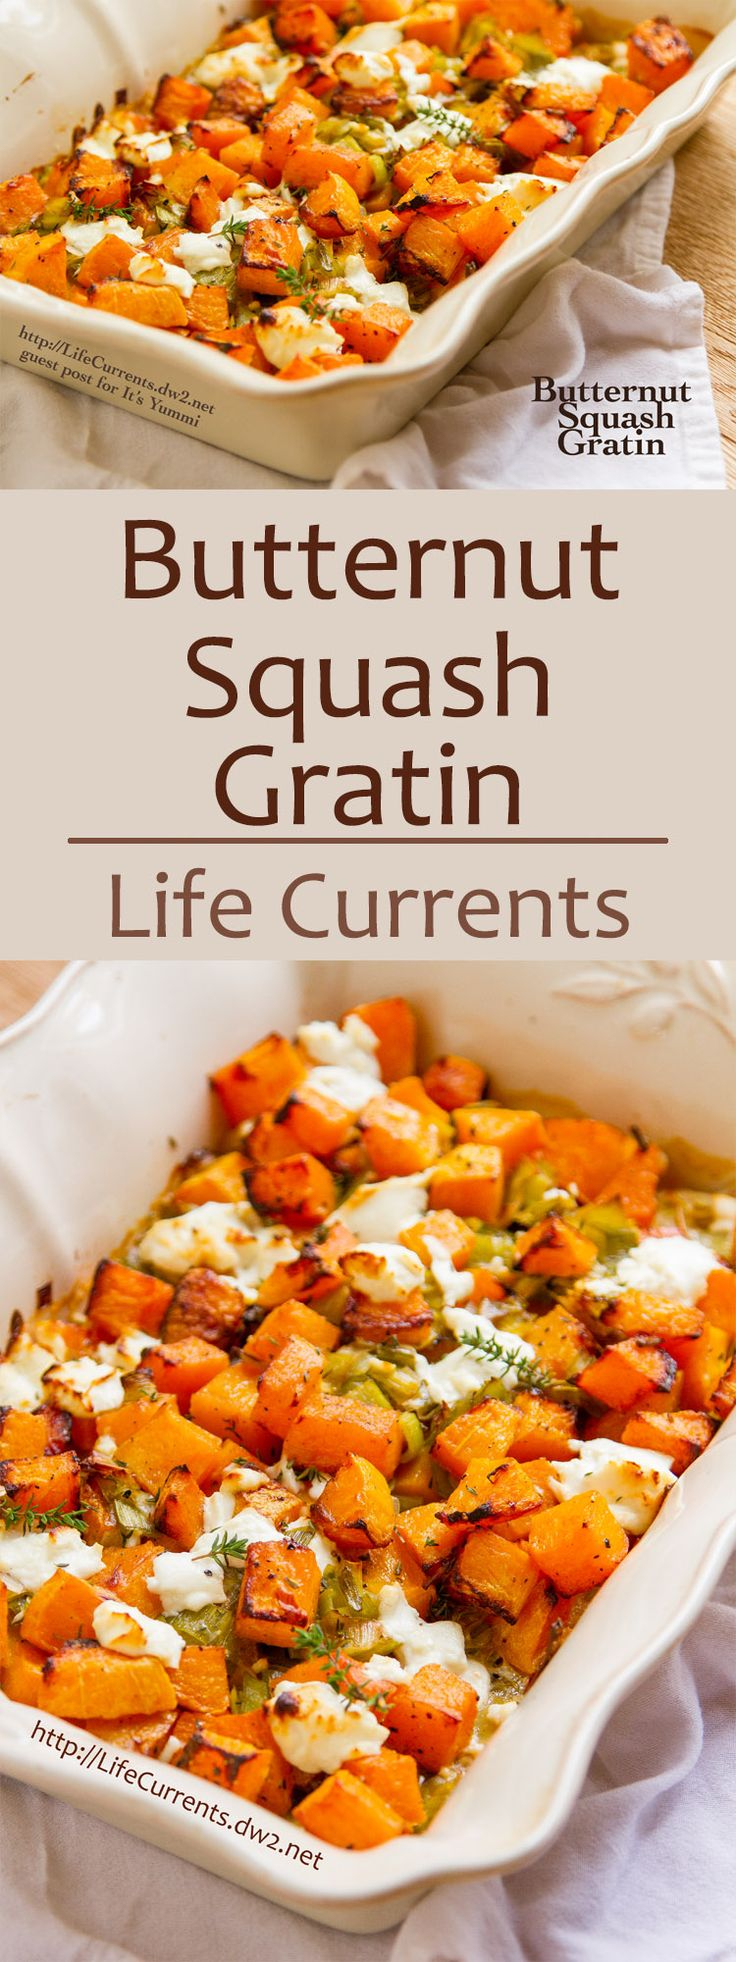 It's a great balance of flavors, filling earthy butternut squash, oniony leeks…